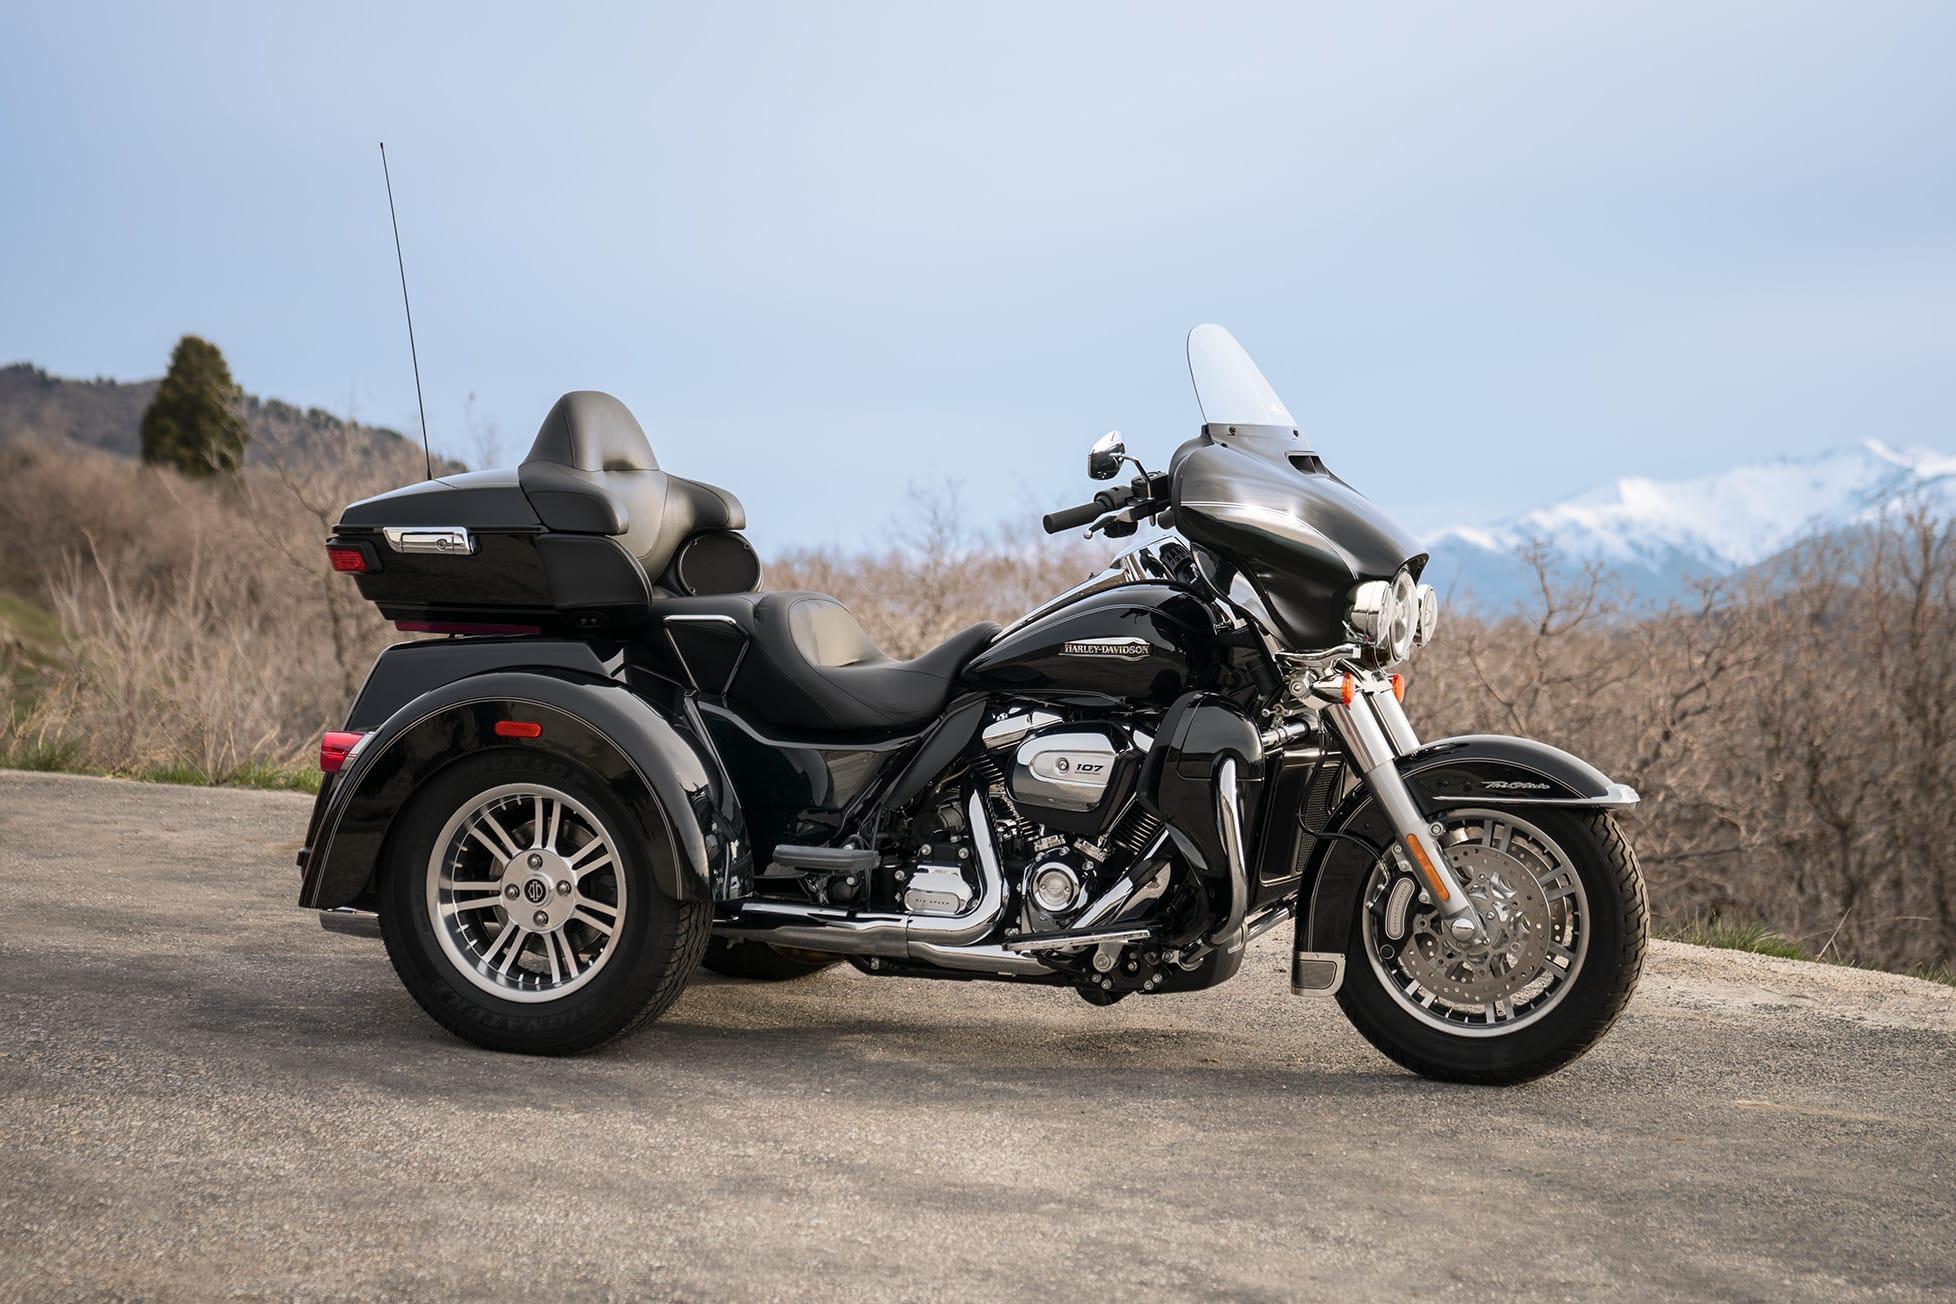 2012 Harley Trike Wiring Diagram Auto Electrical Flhx For Tri Glide